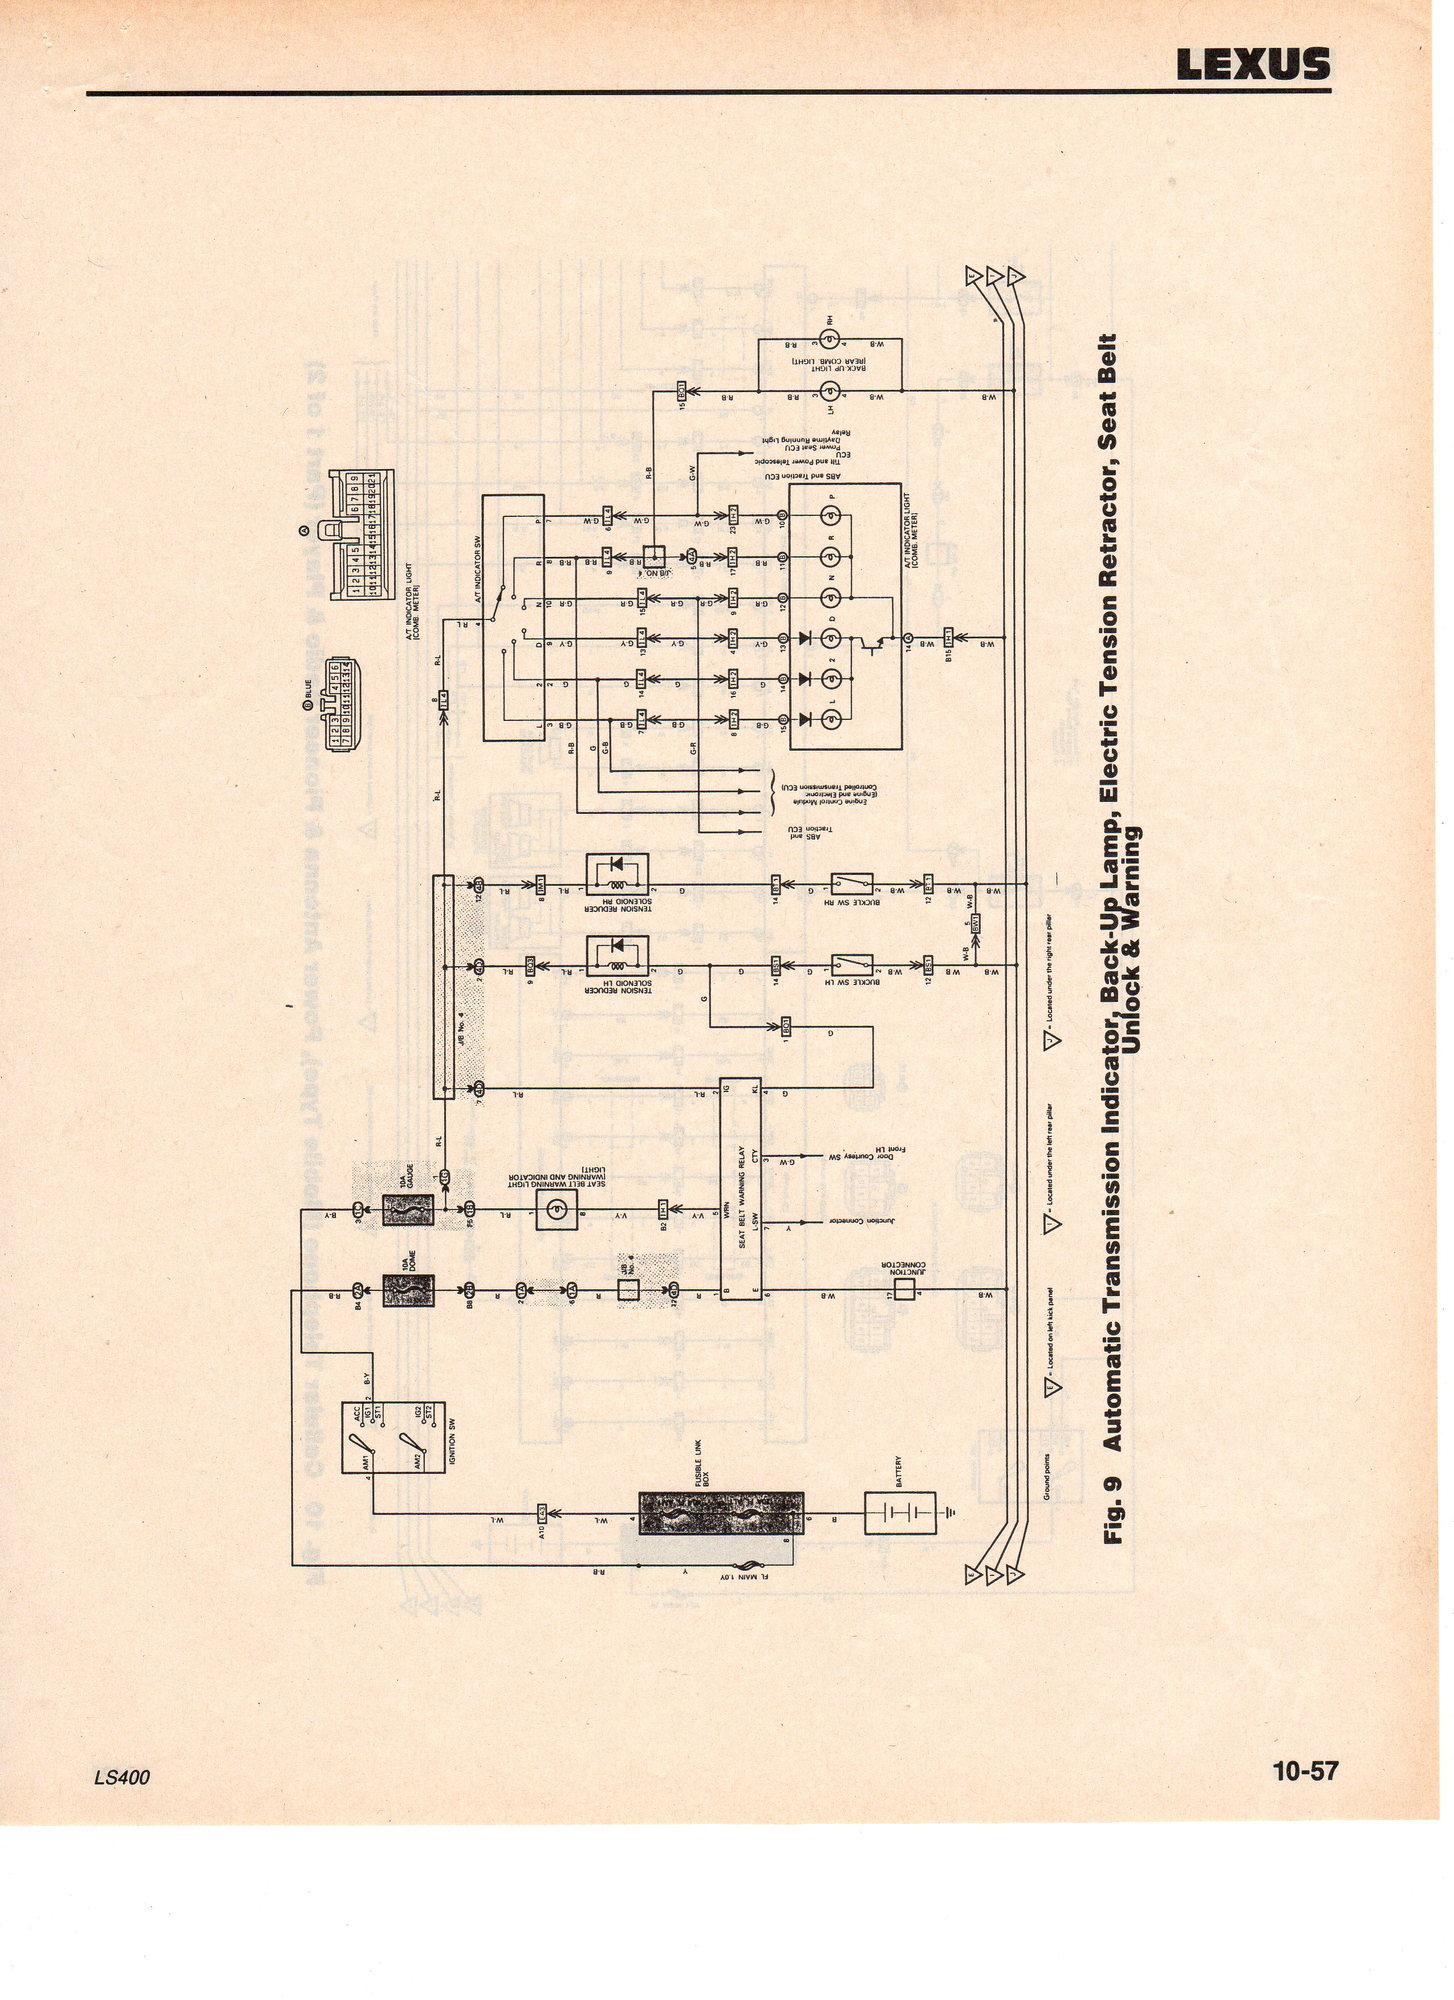 1994 ls400 wiring diagrams!! Finally! 1uzfe swap info ...